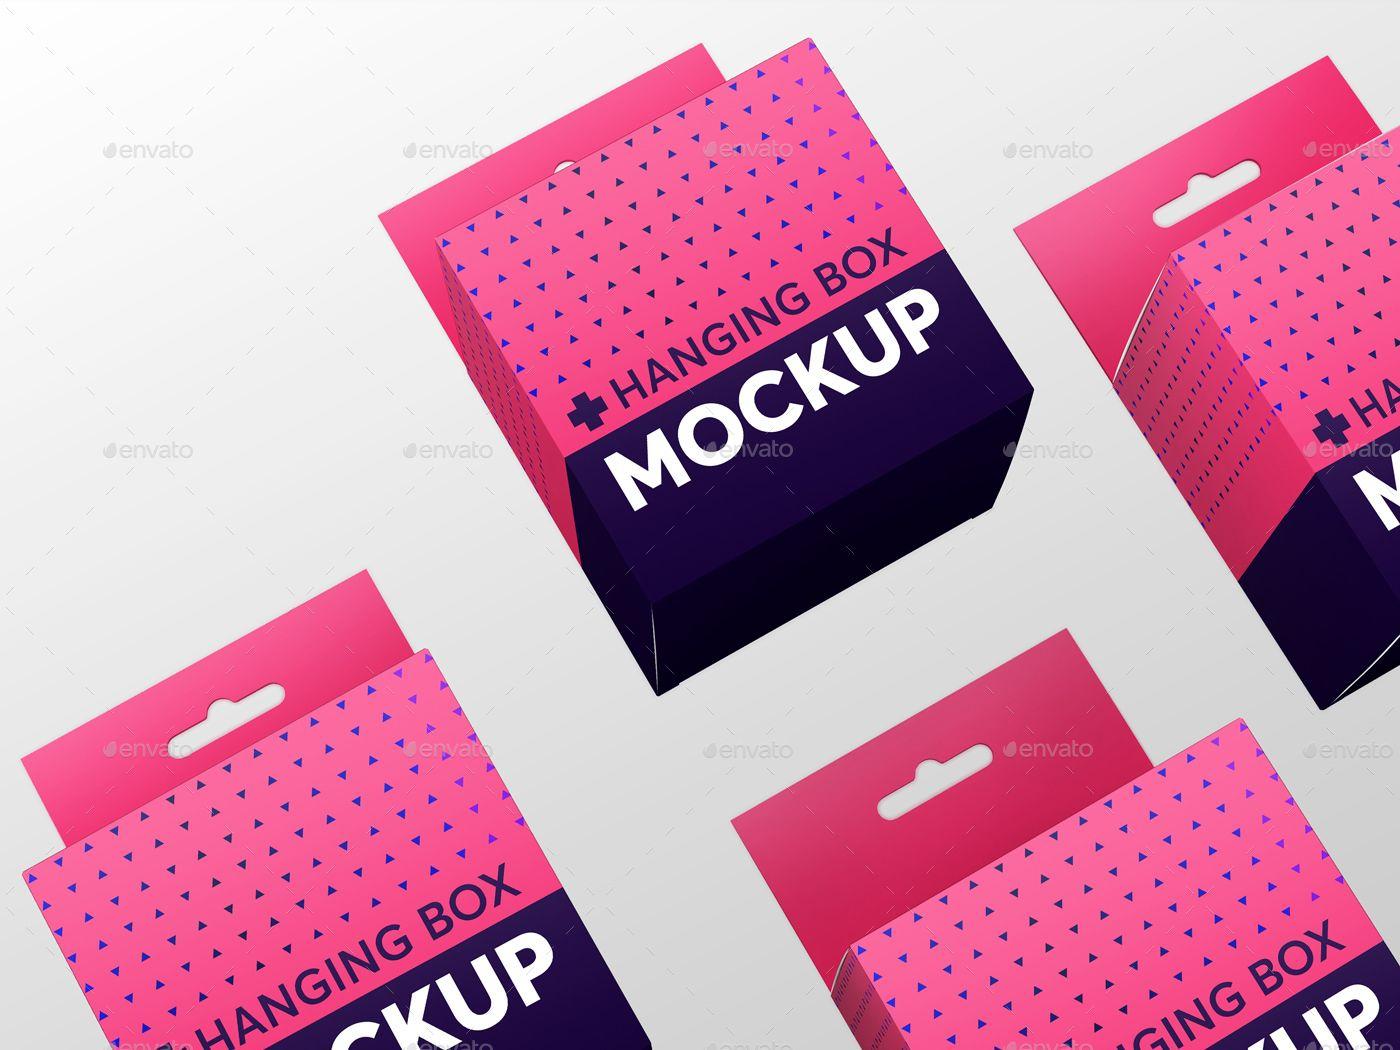 Download Hanging Square Box Mockups V1 Square Hanging Box Mockups Box Mockup Business Card Mock Up Box Packaging Design